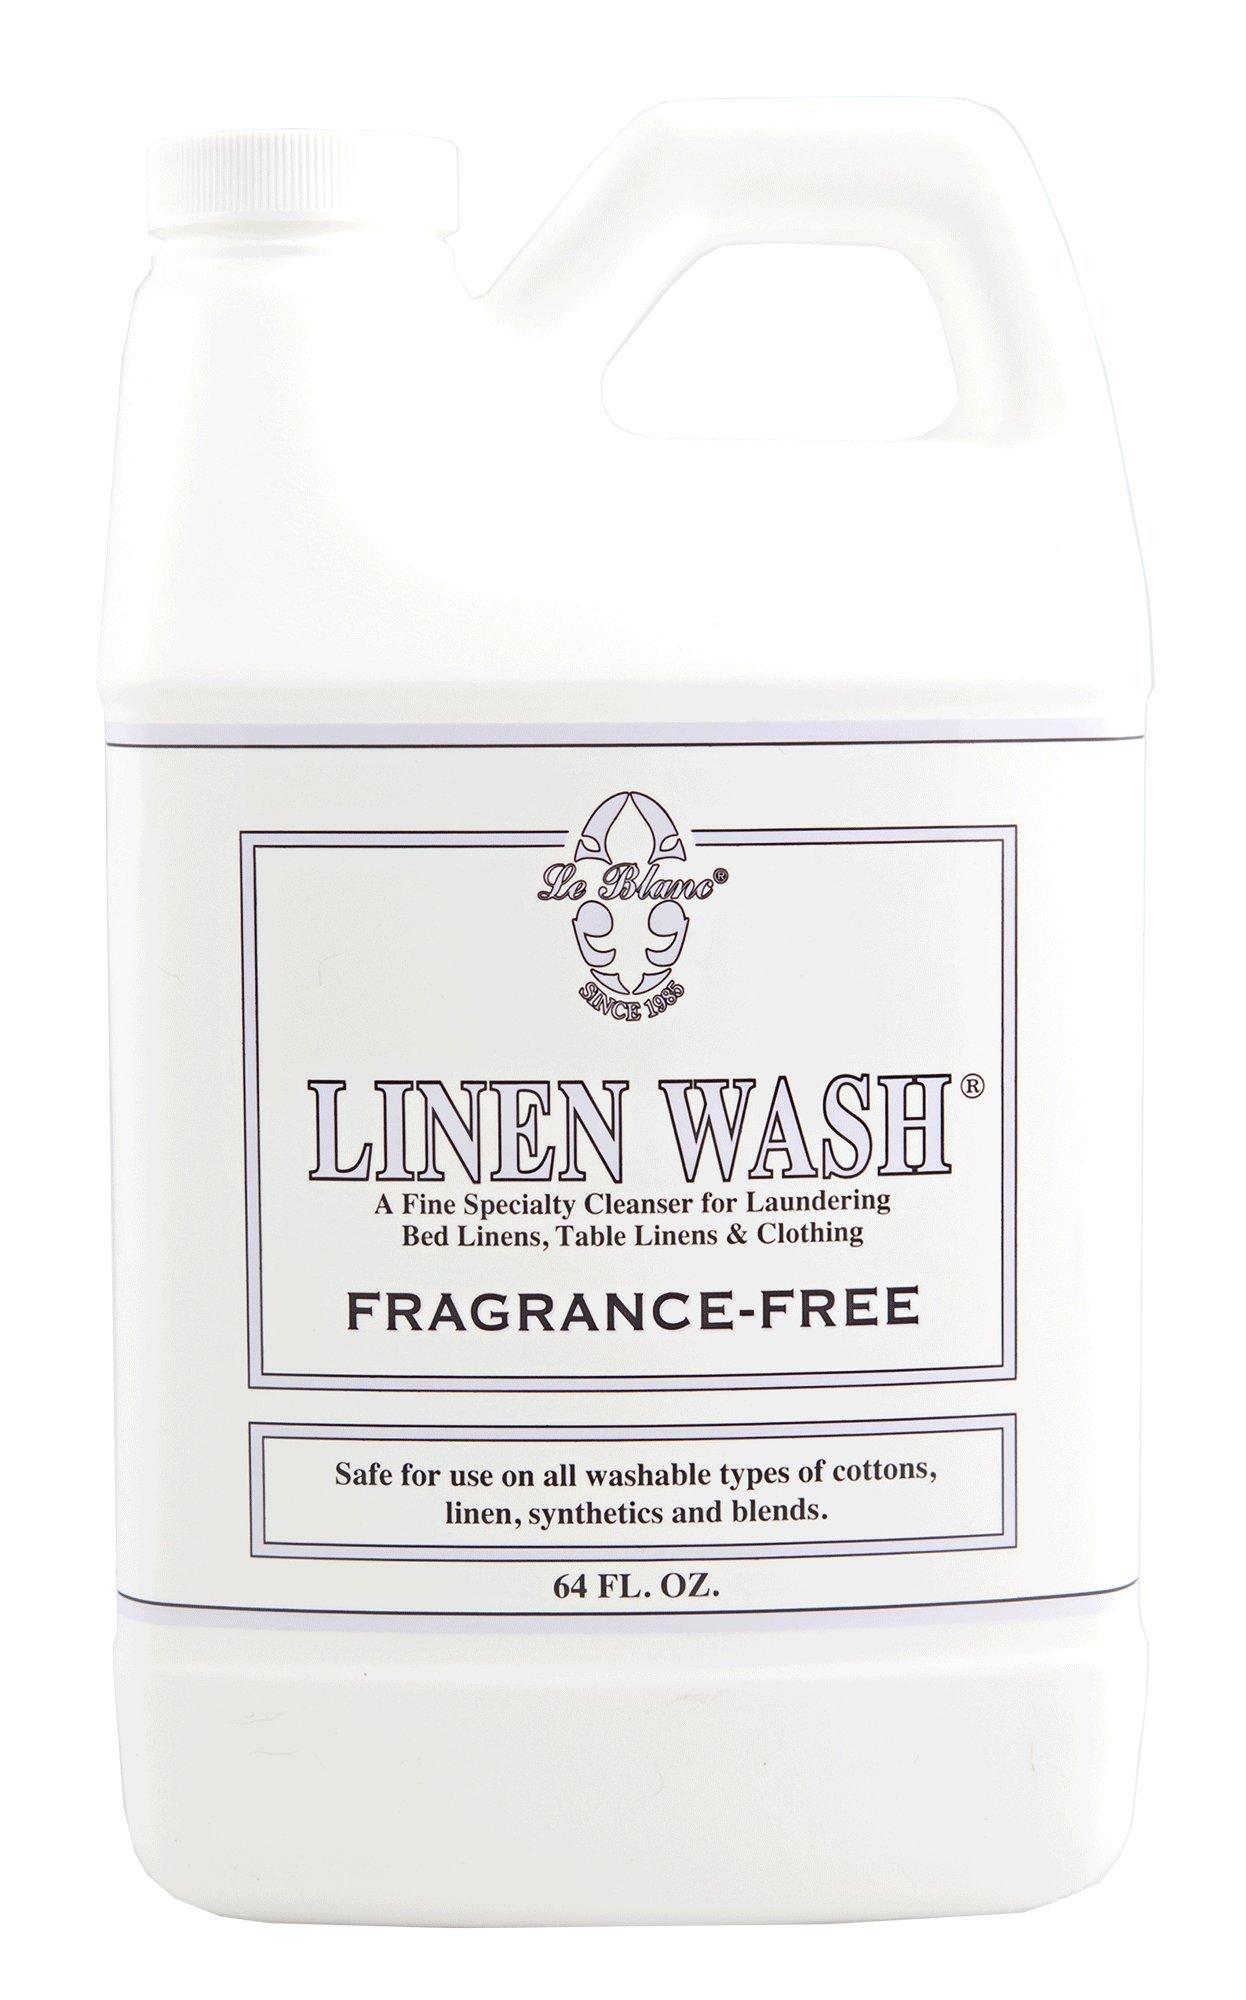 Le Blanc® Fragrance Free Linen Wash - 64 FL. OZ, 3 Pack by LE BLANC (Image #1)